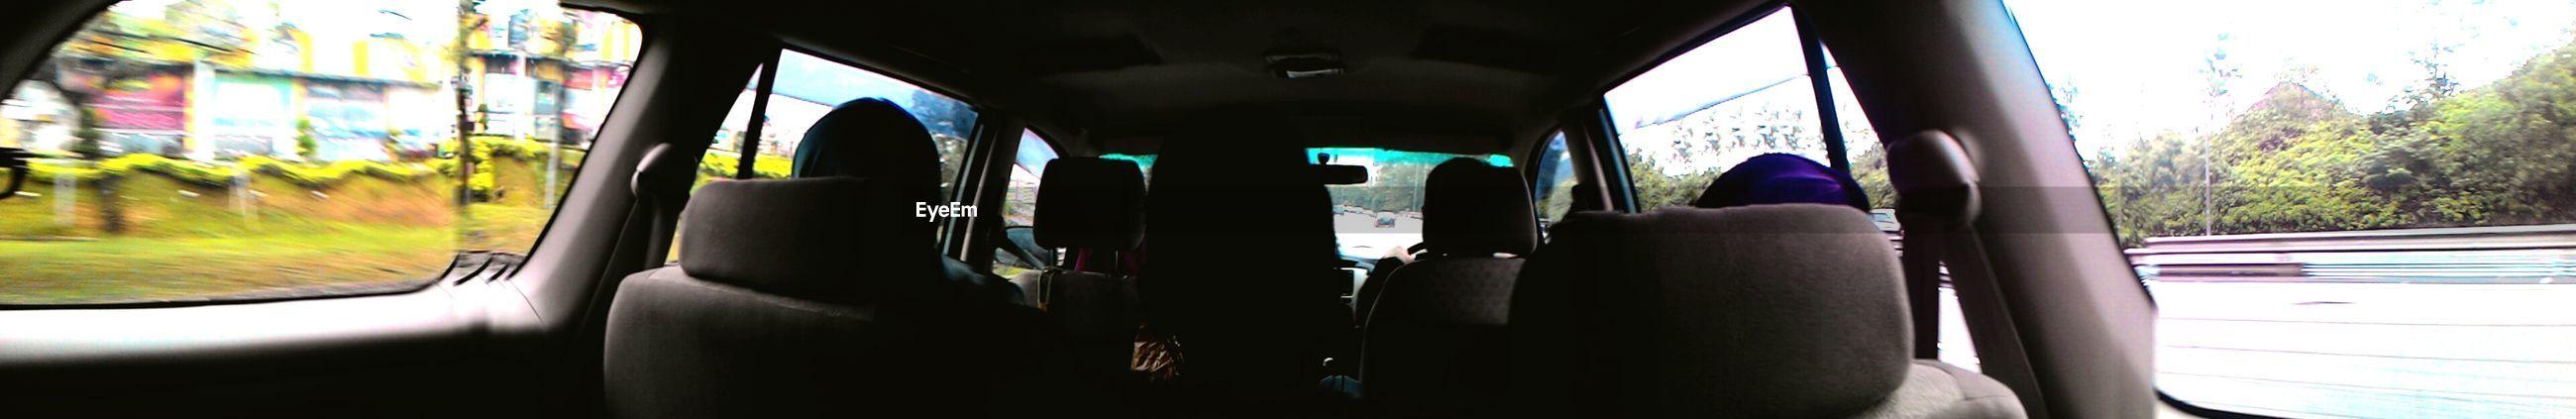 transportation, vehicle interior, mode of transport, indoors, travel, glass - material, window, vehicle seat, land vehicle, public transportation, car, train - vehicle, transparent, bus, windshield, car interior, journey, day, passenger train, train